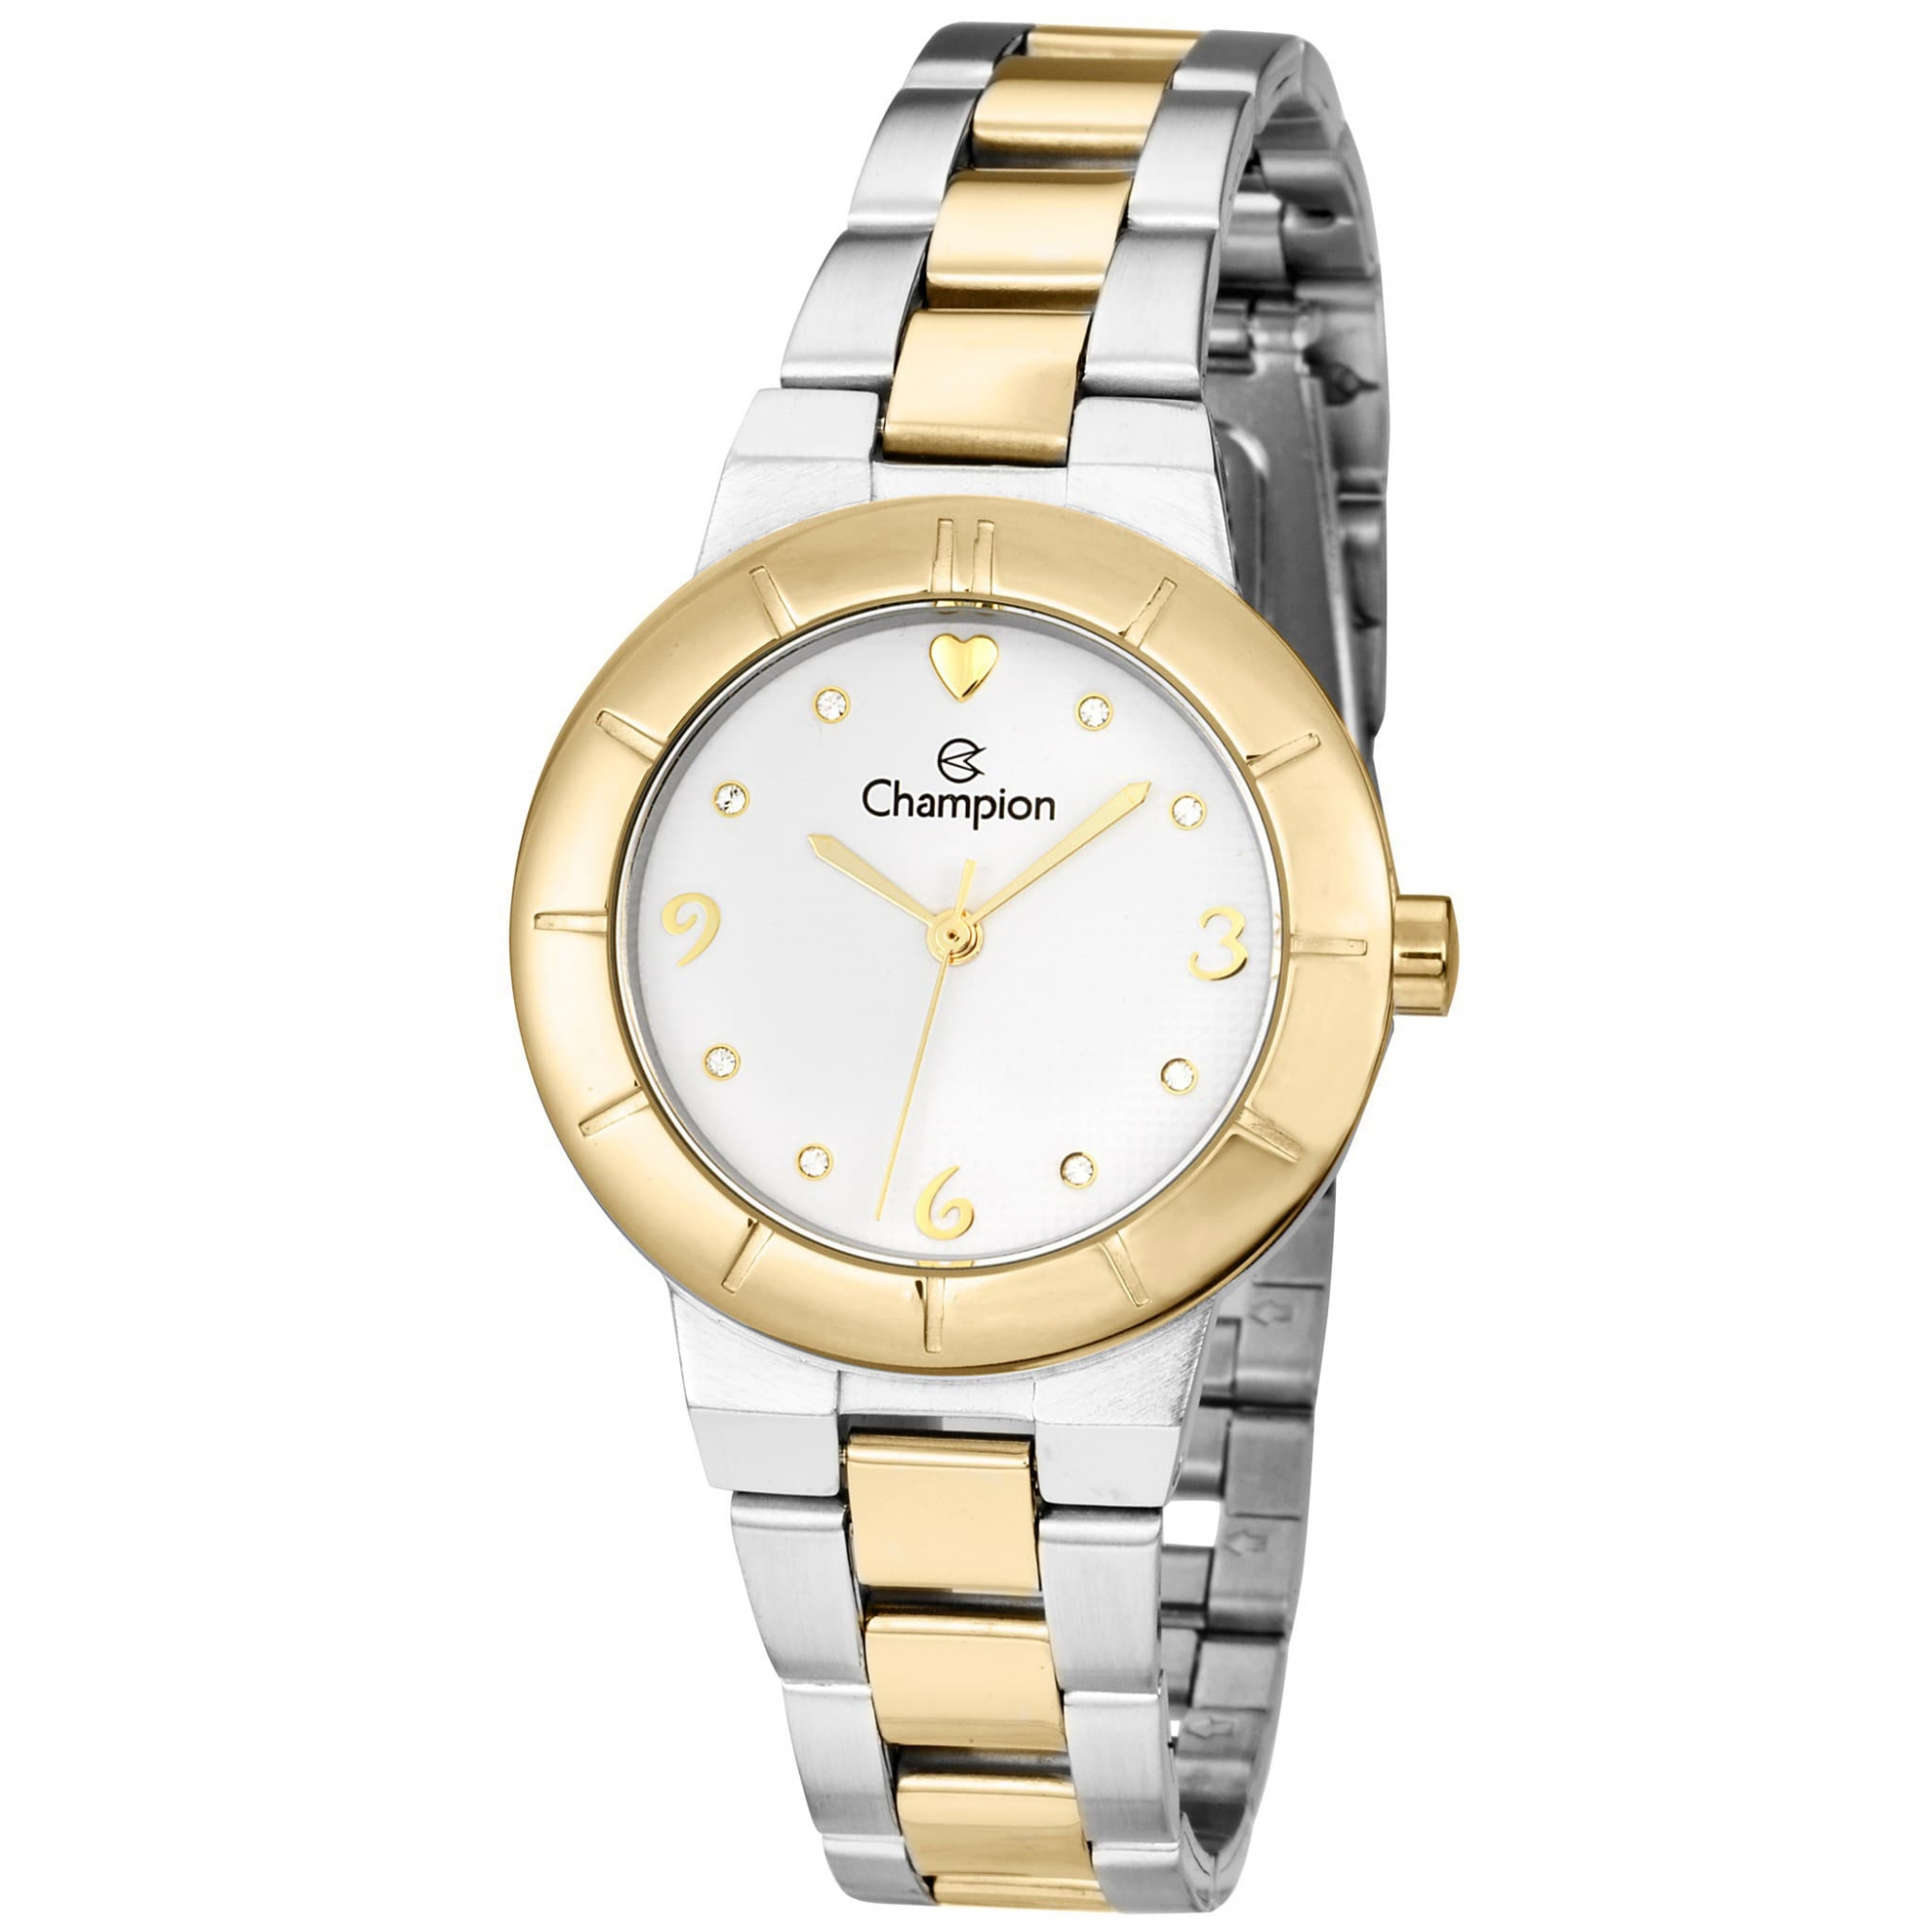 Relógio Champion Feminino Bicolor Social - CH26855B